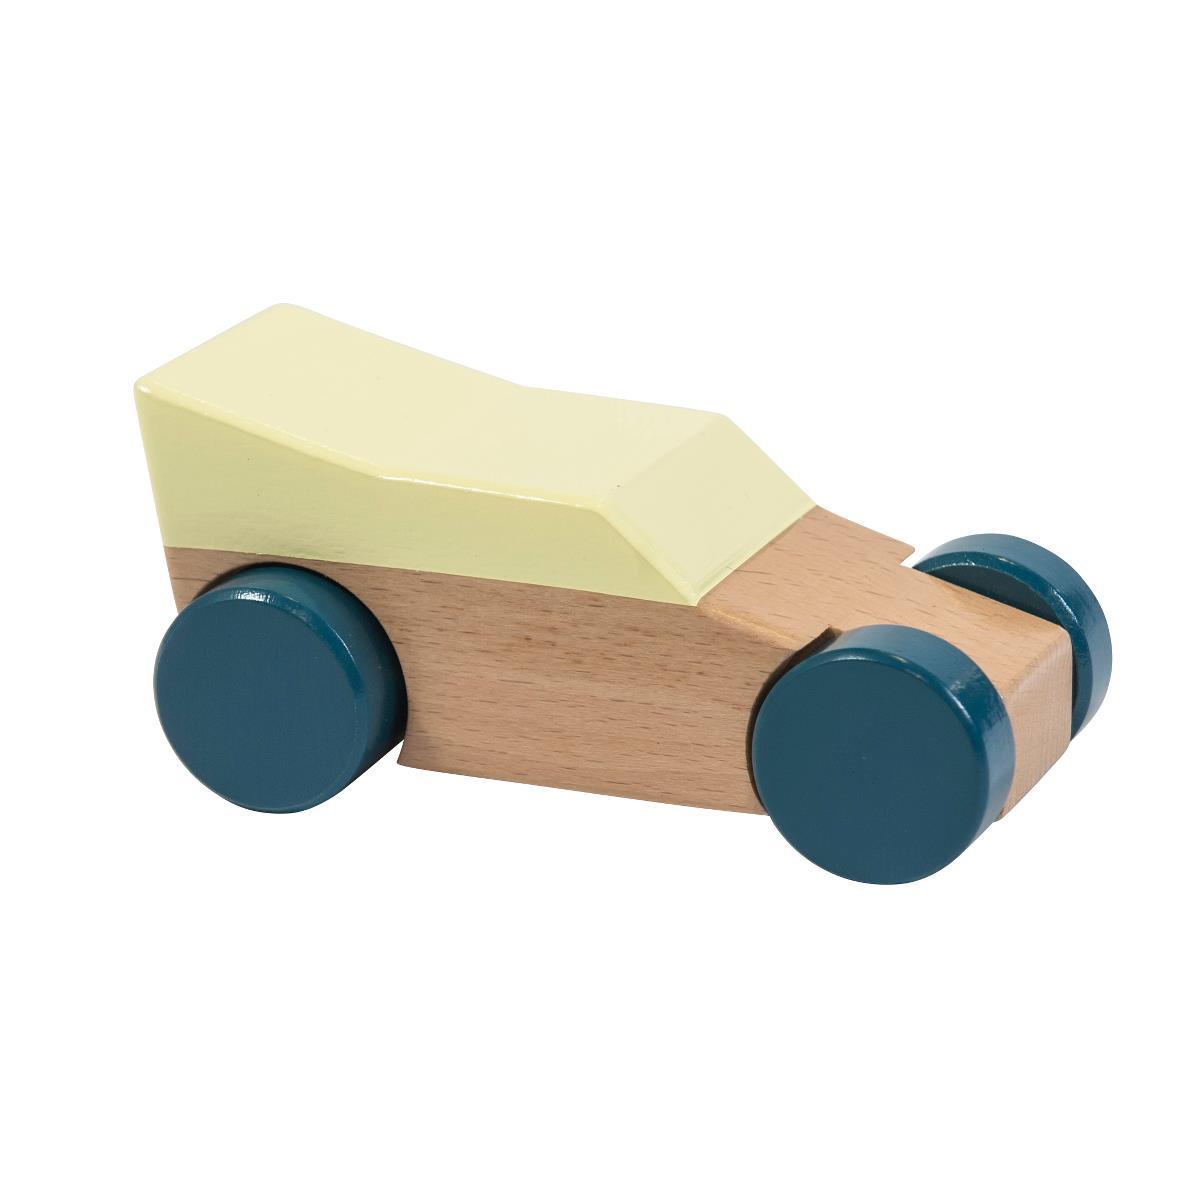 sebra Rennwagen aus Holz, gelb 3019303 - 01